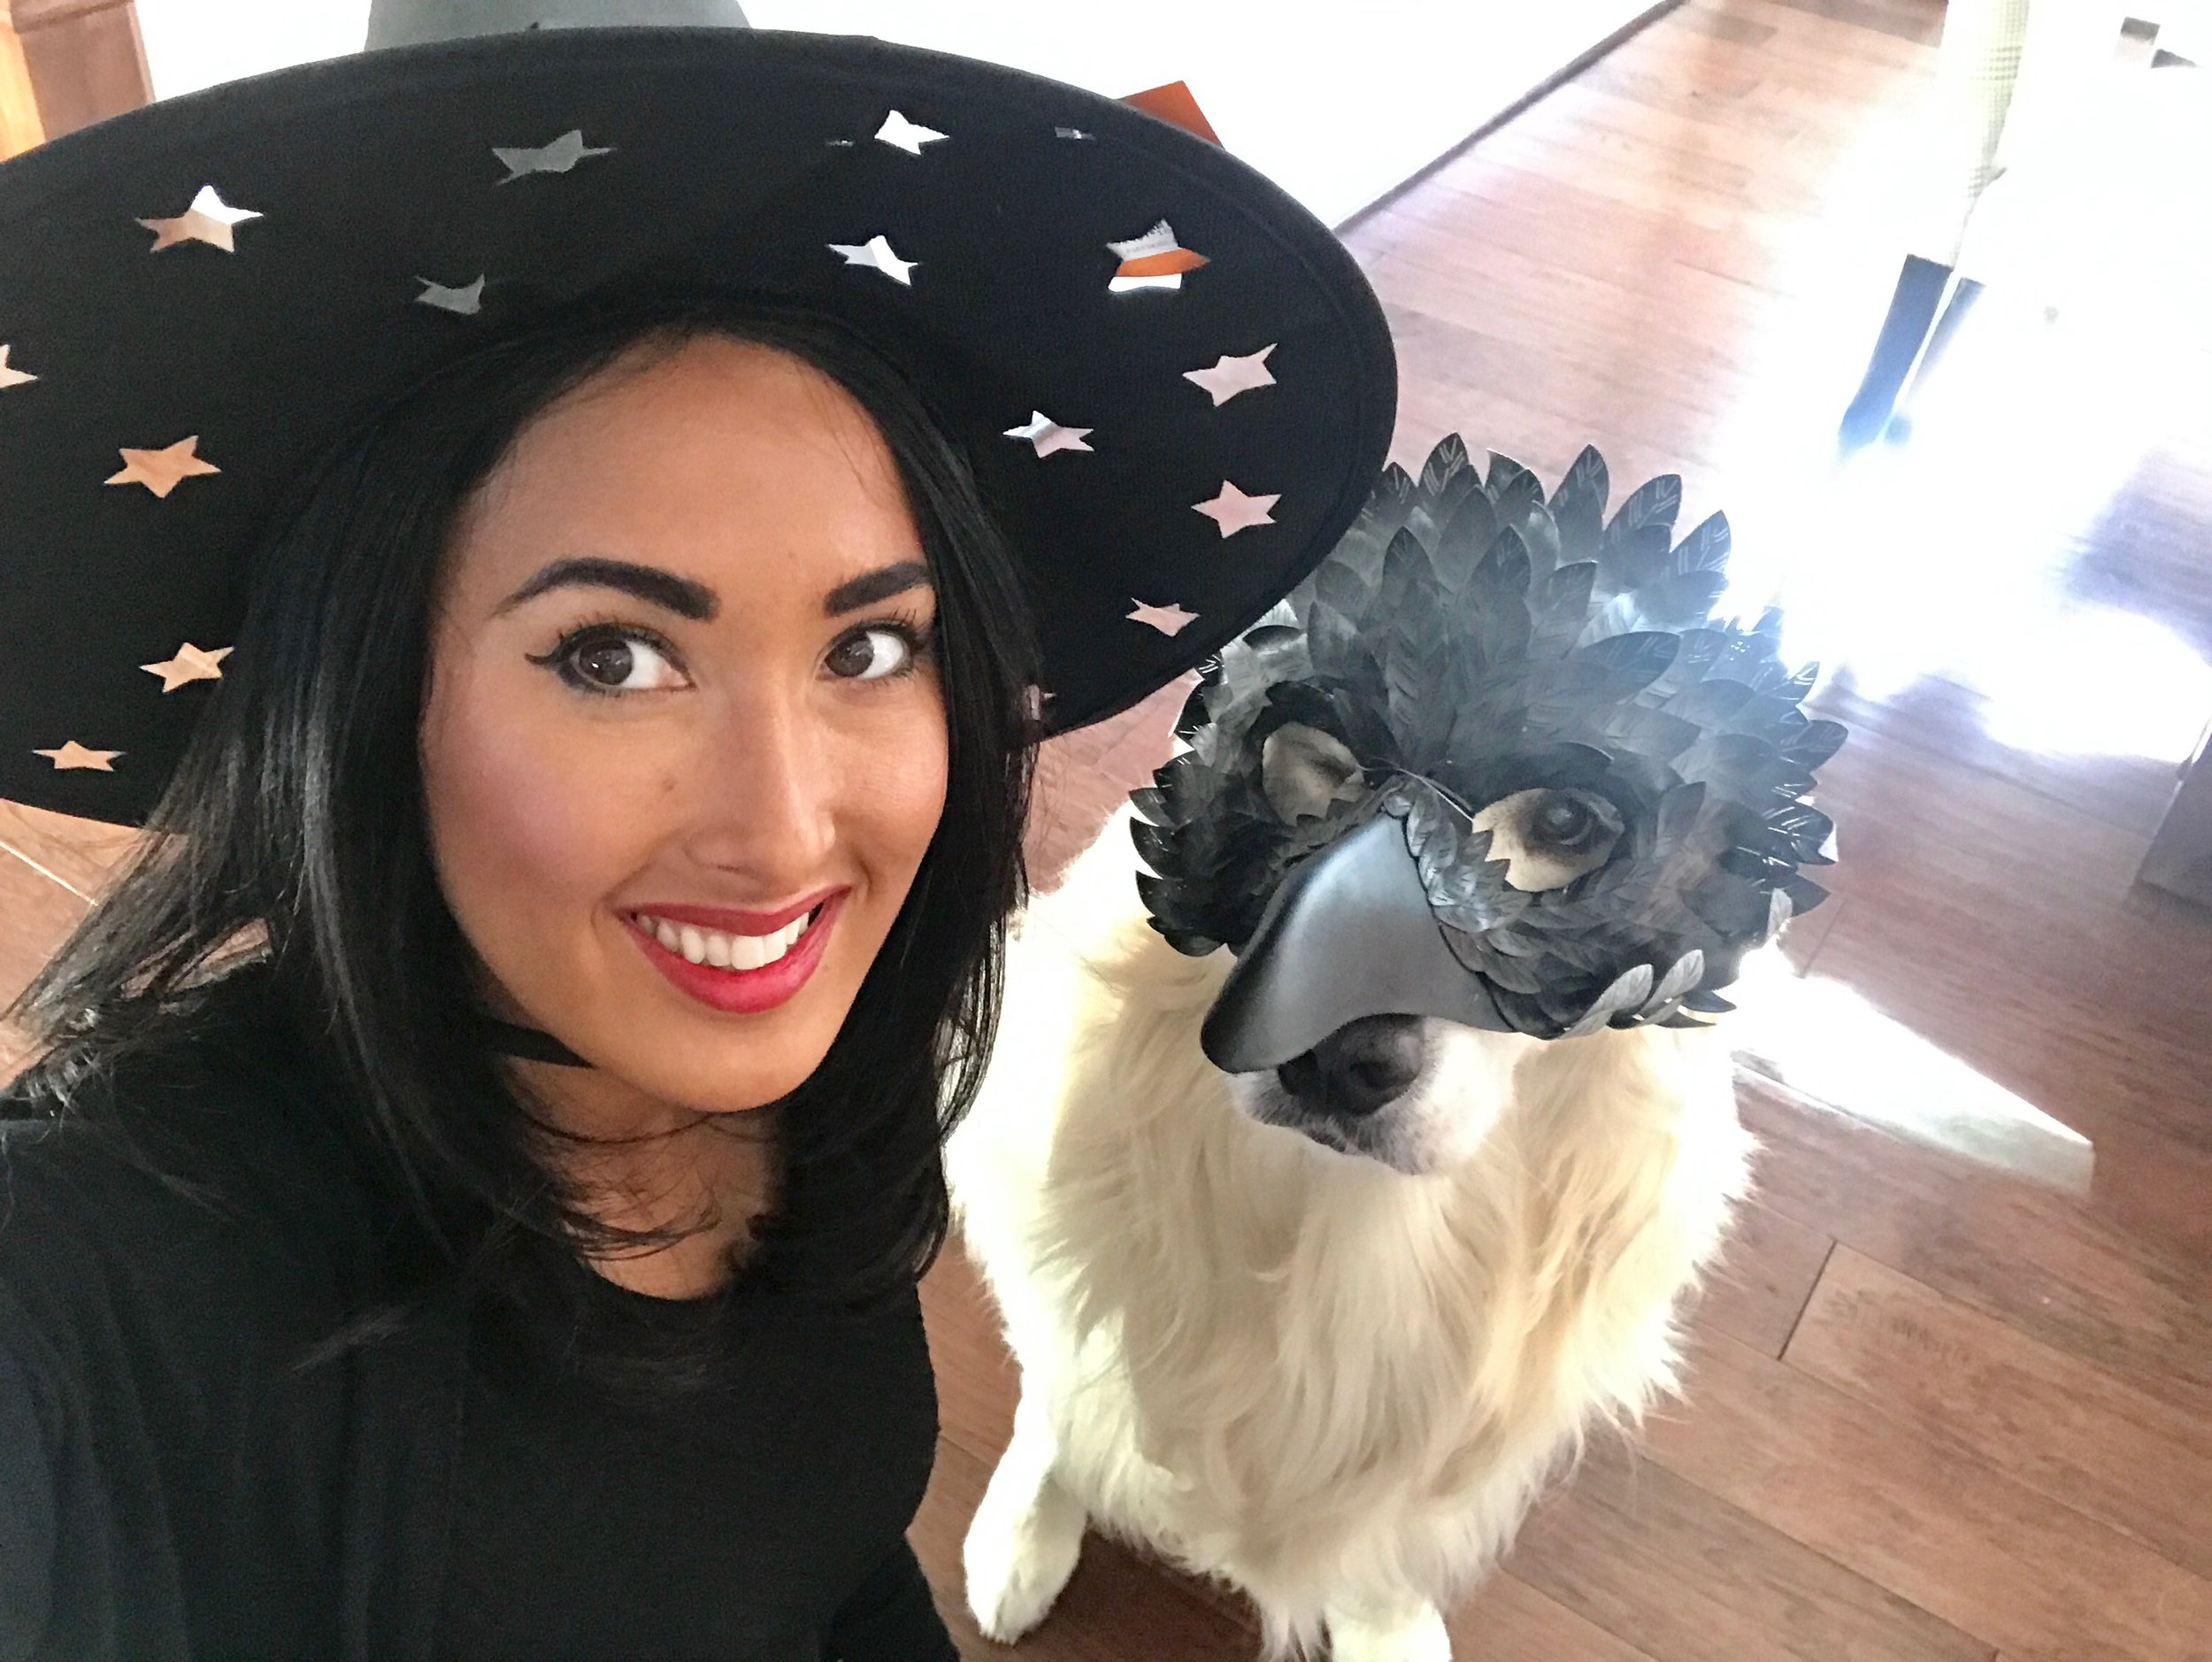 birds are creepy